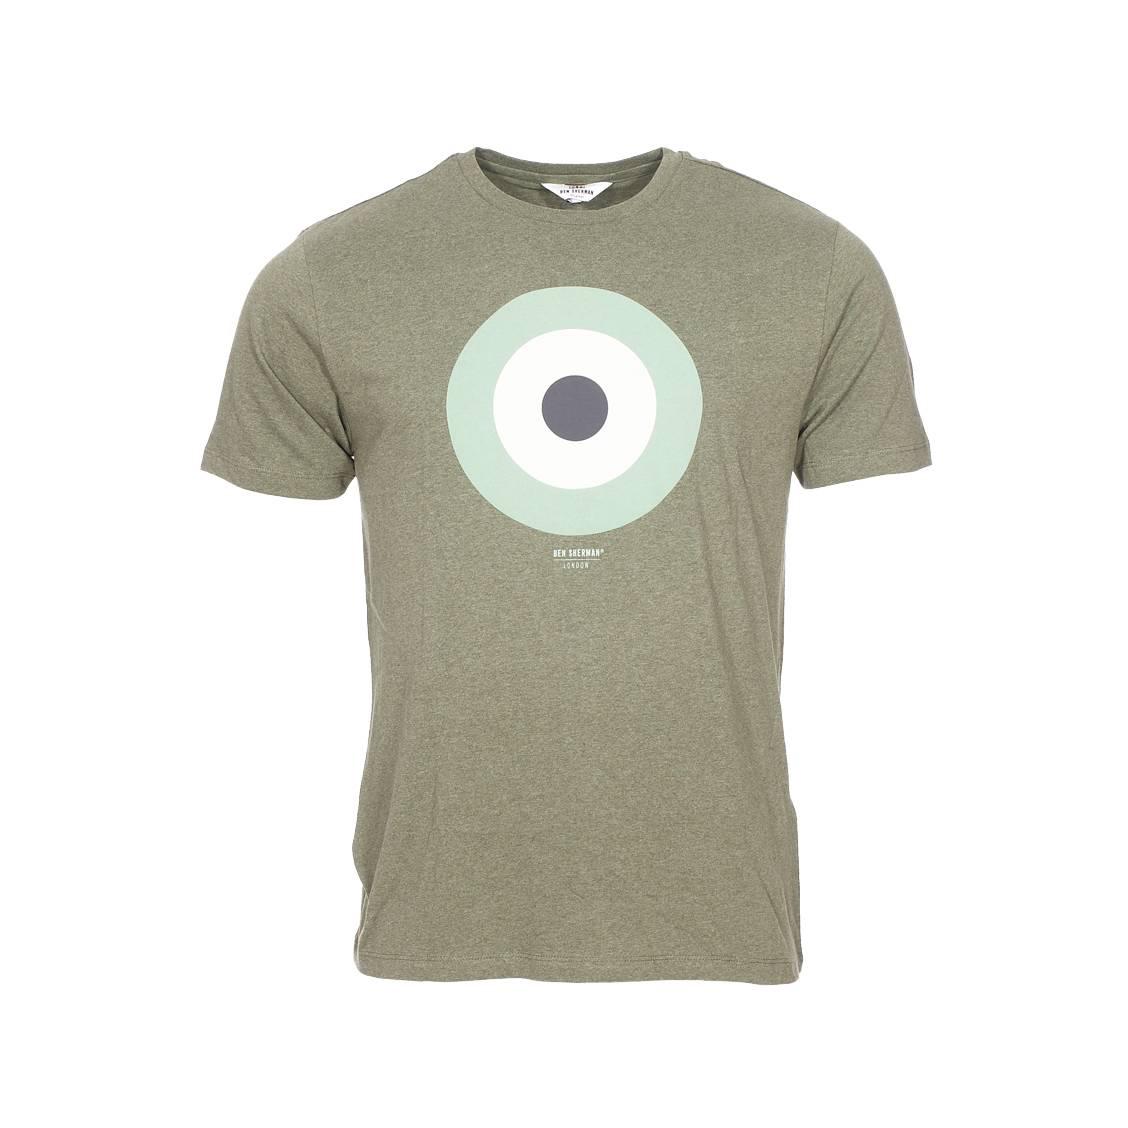 Tee-shirt col rond  the target en coton vert chiné